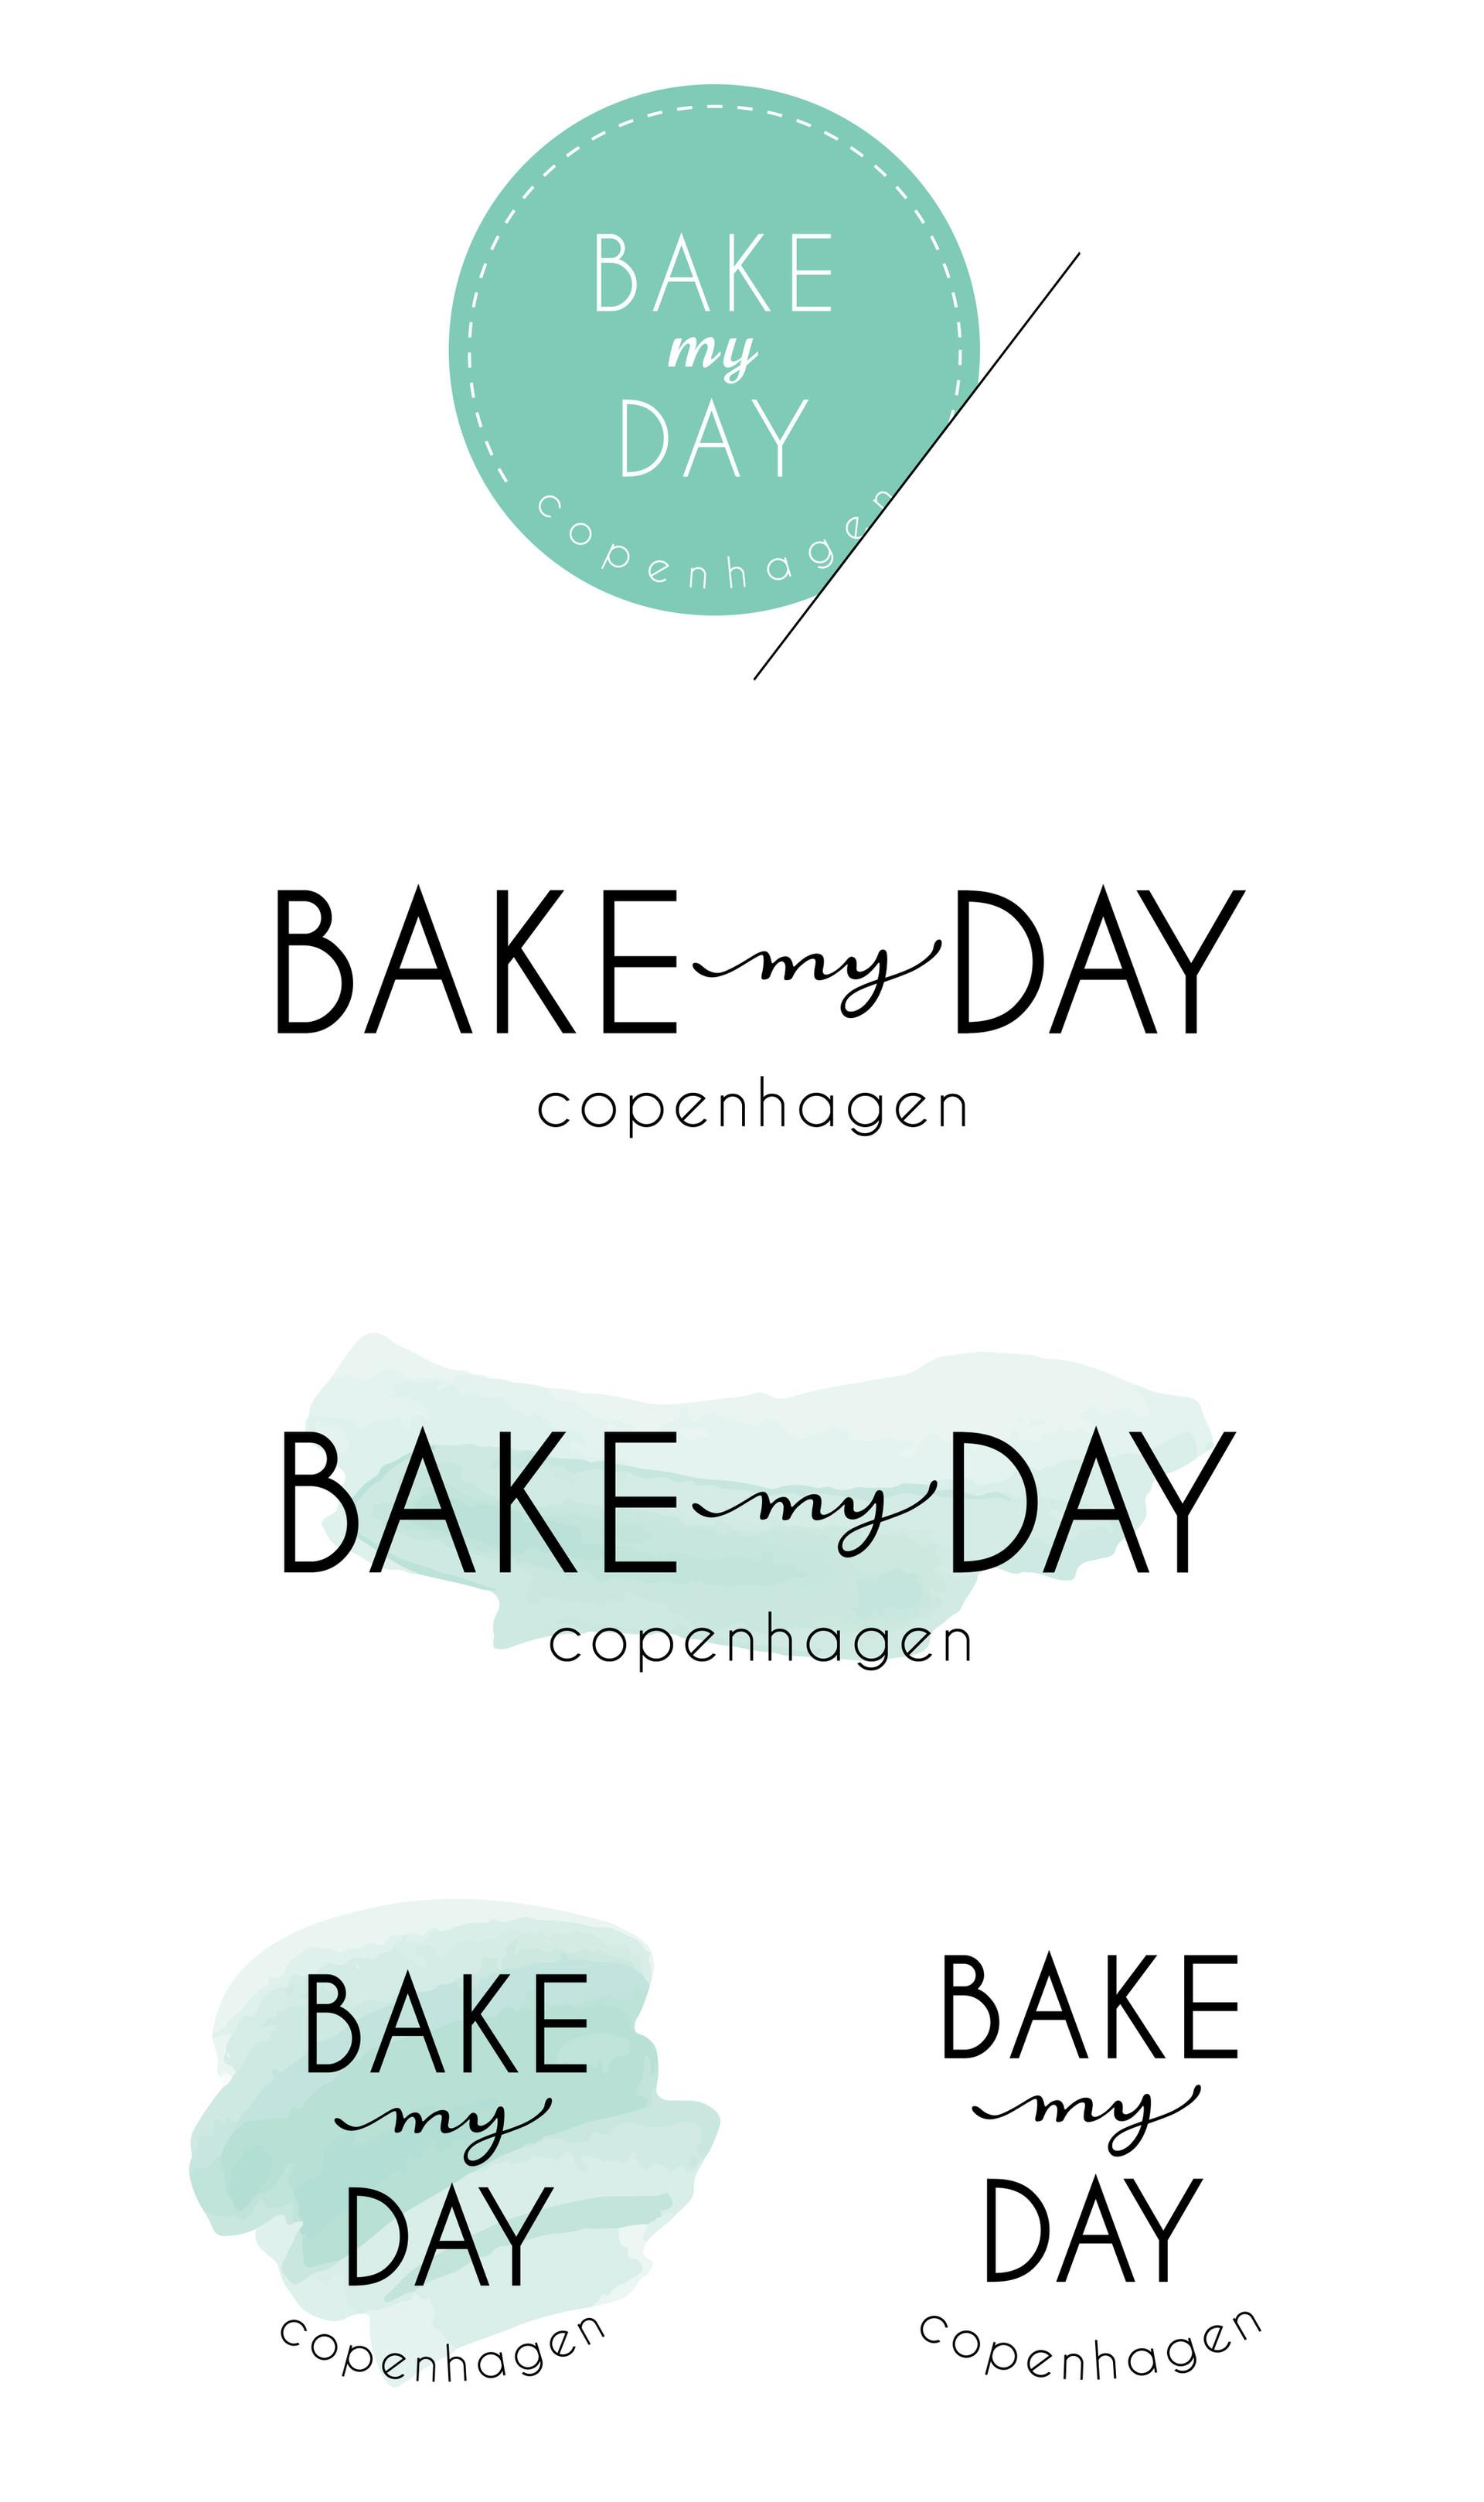 case bake my day 02